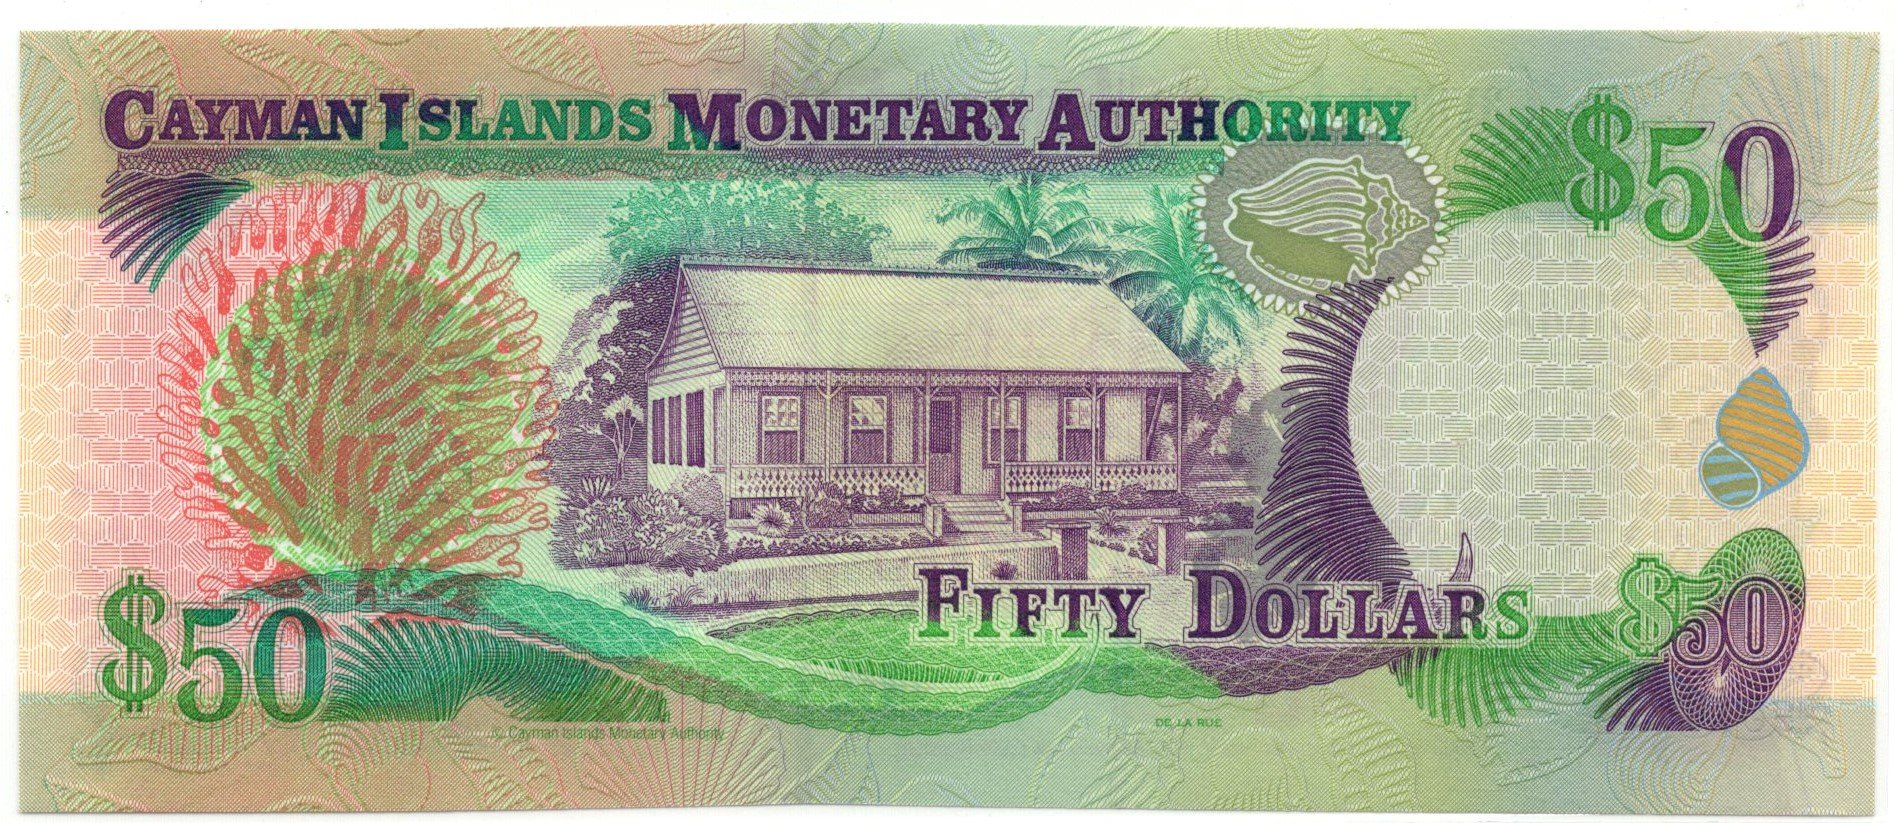 Cayman islands 50 dollars 2003 back